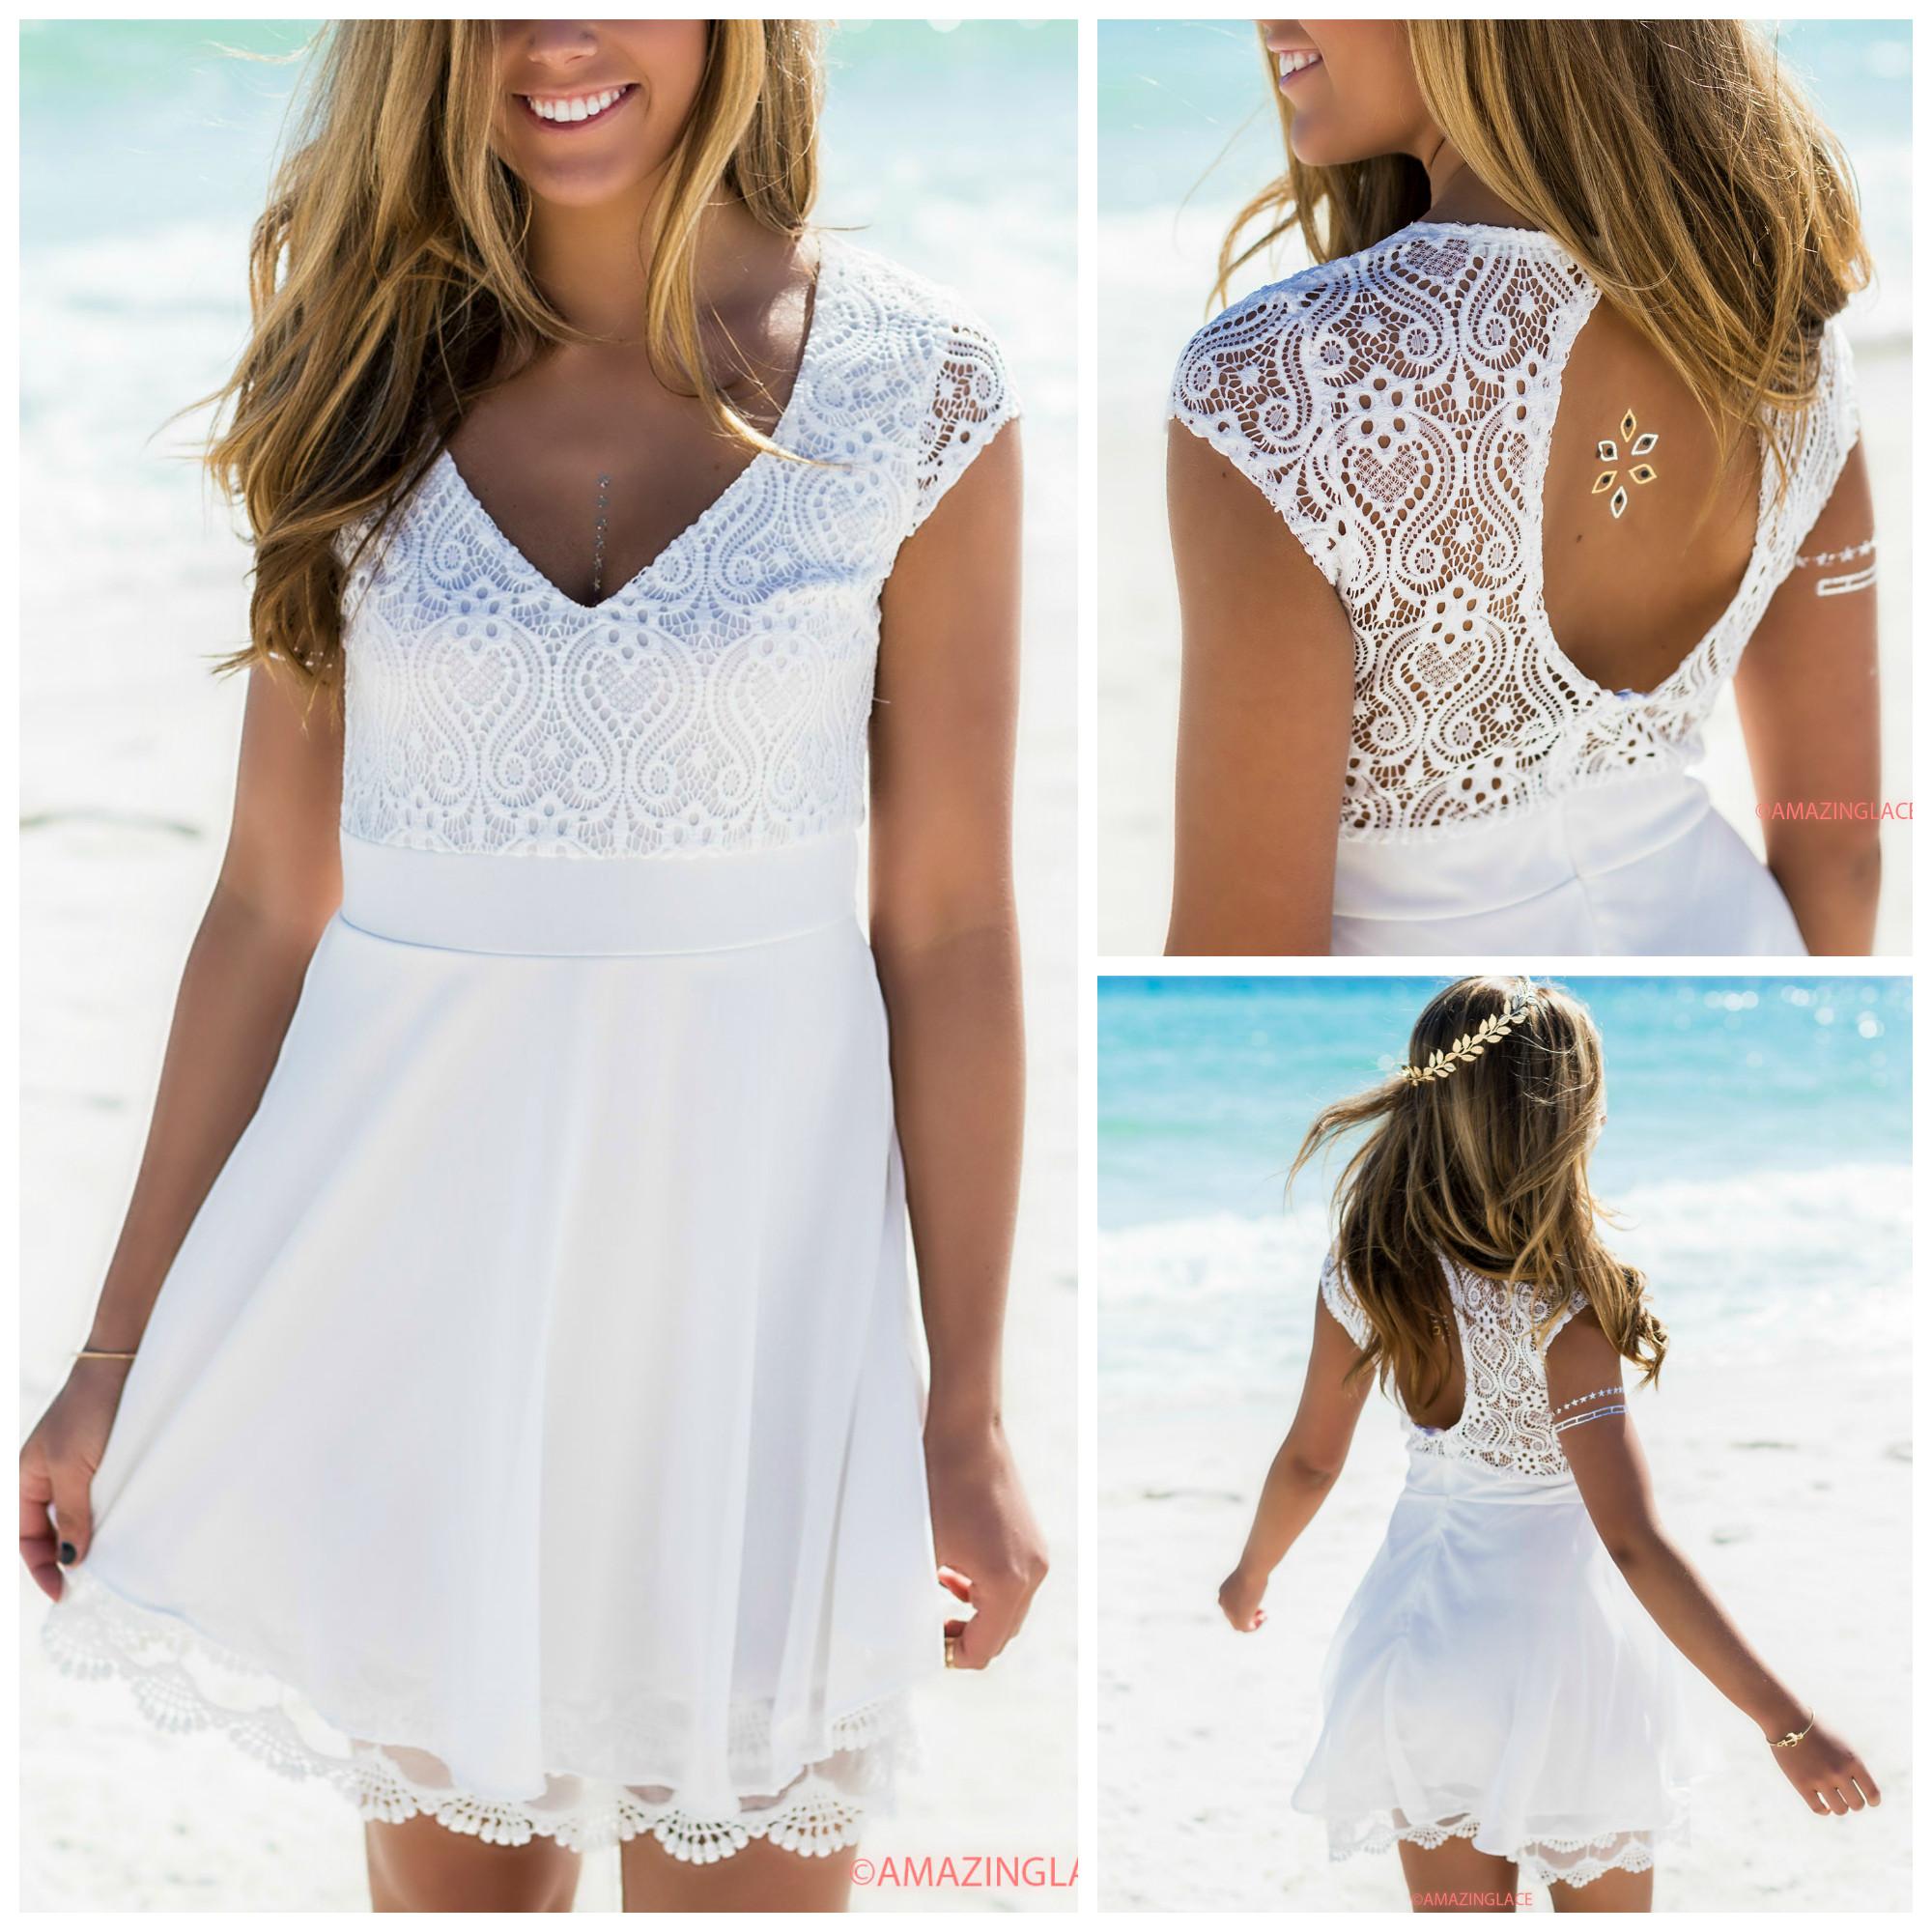 dress - White Amazing lace dresses video